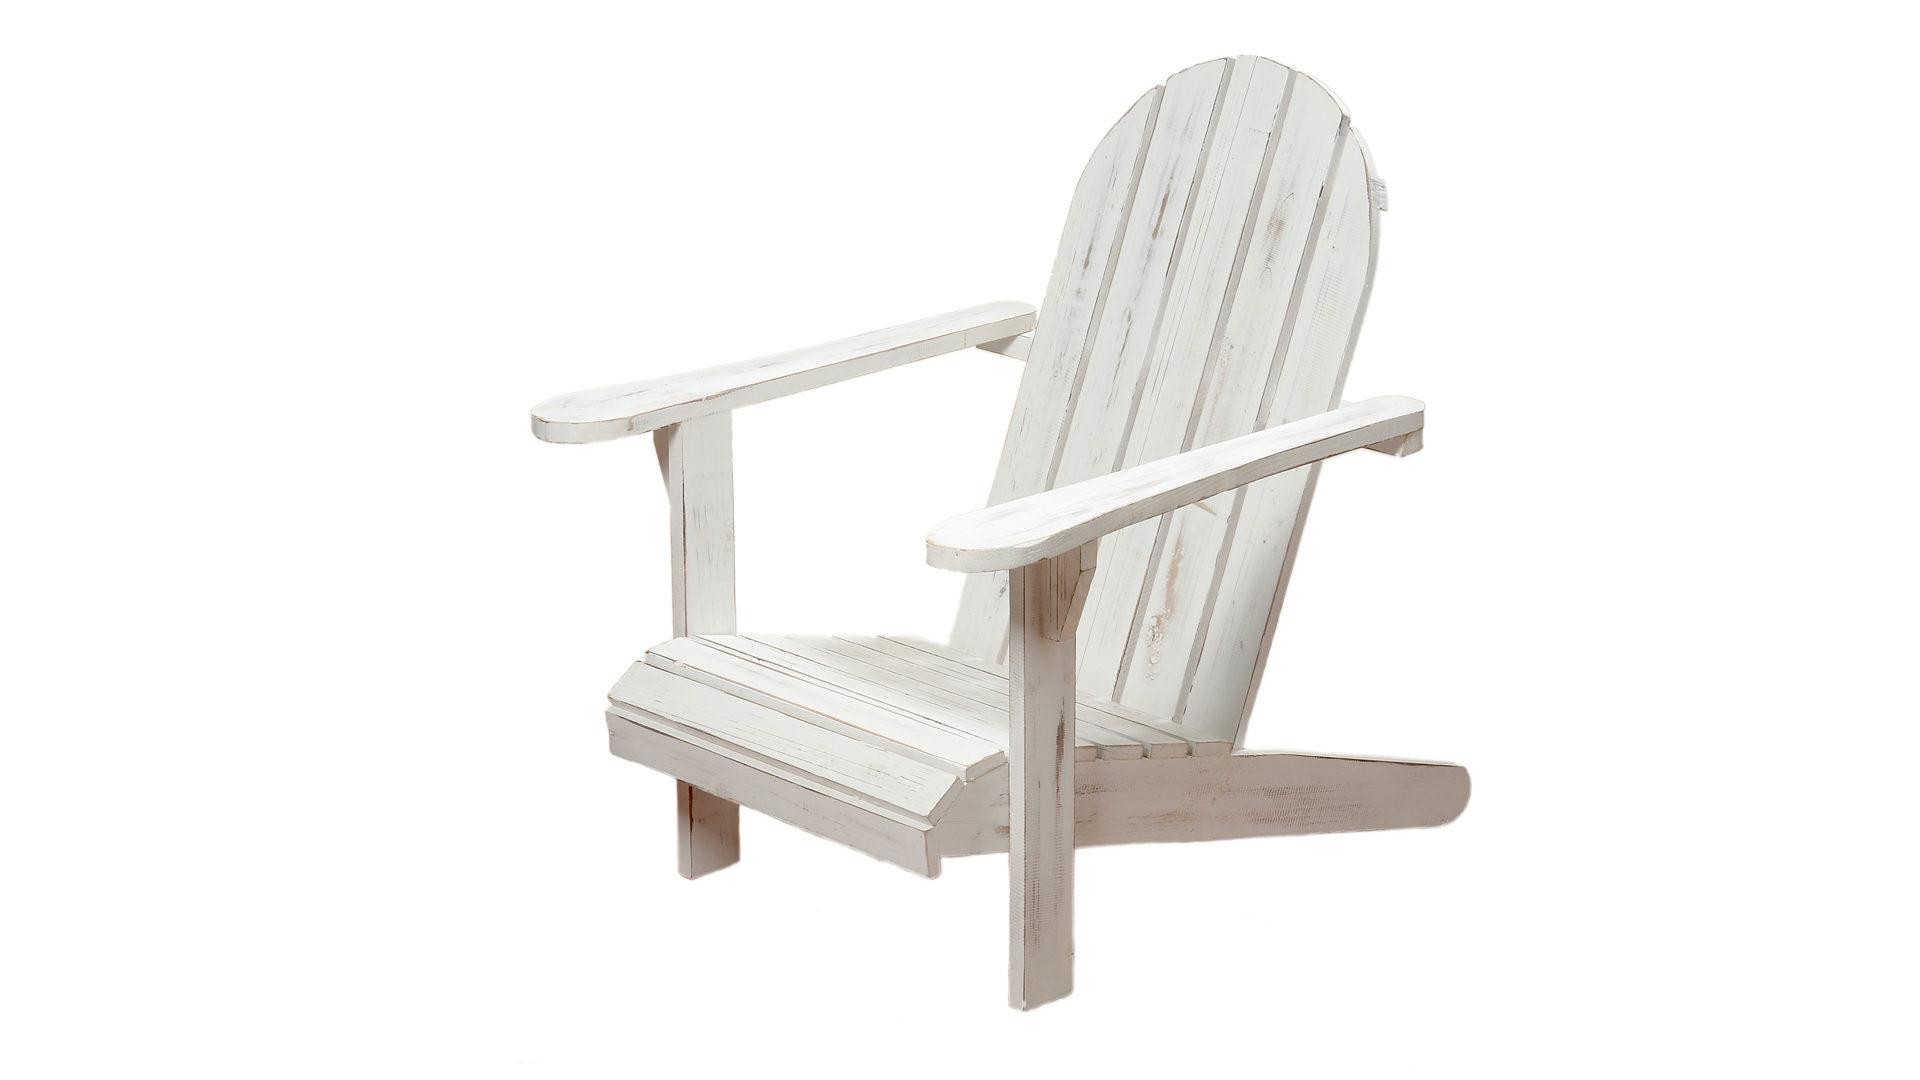 Relaxstuhl Jacky als stilvolles Gartenmöbel, weiß lackiertes Holz ...